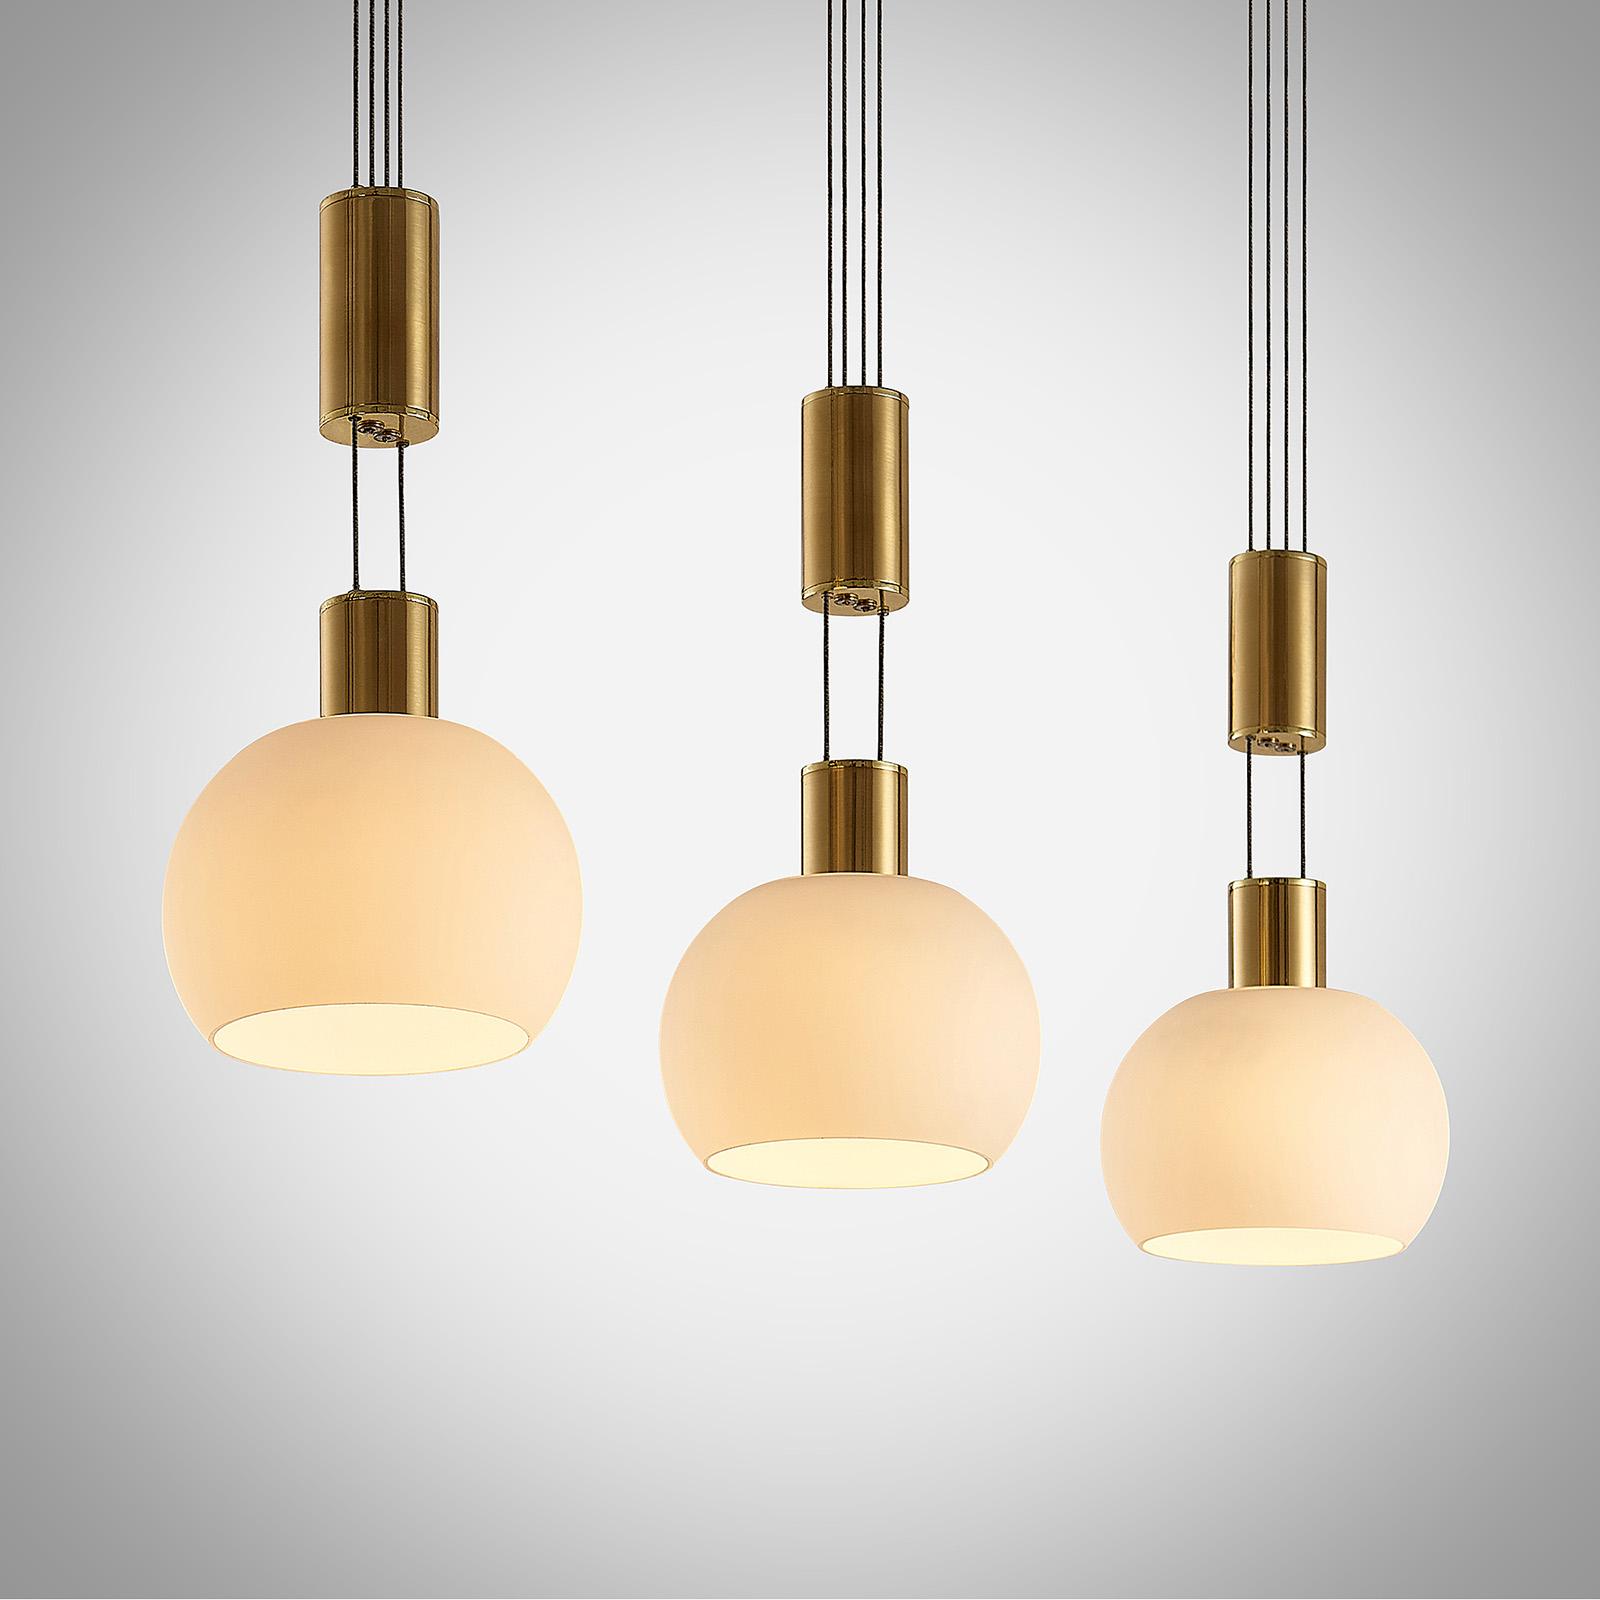 Lindby Aurell lampa wisząca LED 3-pkt., mosiądz